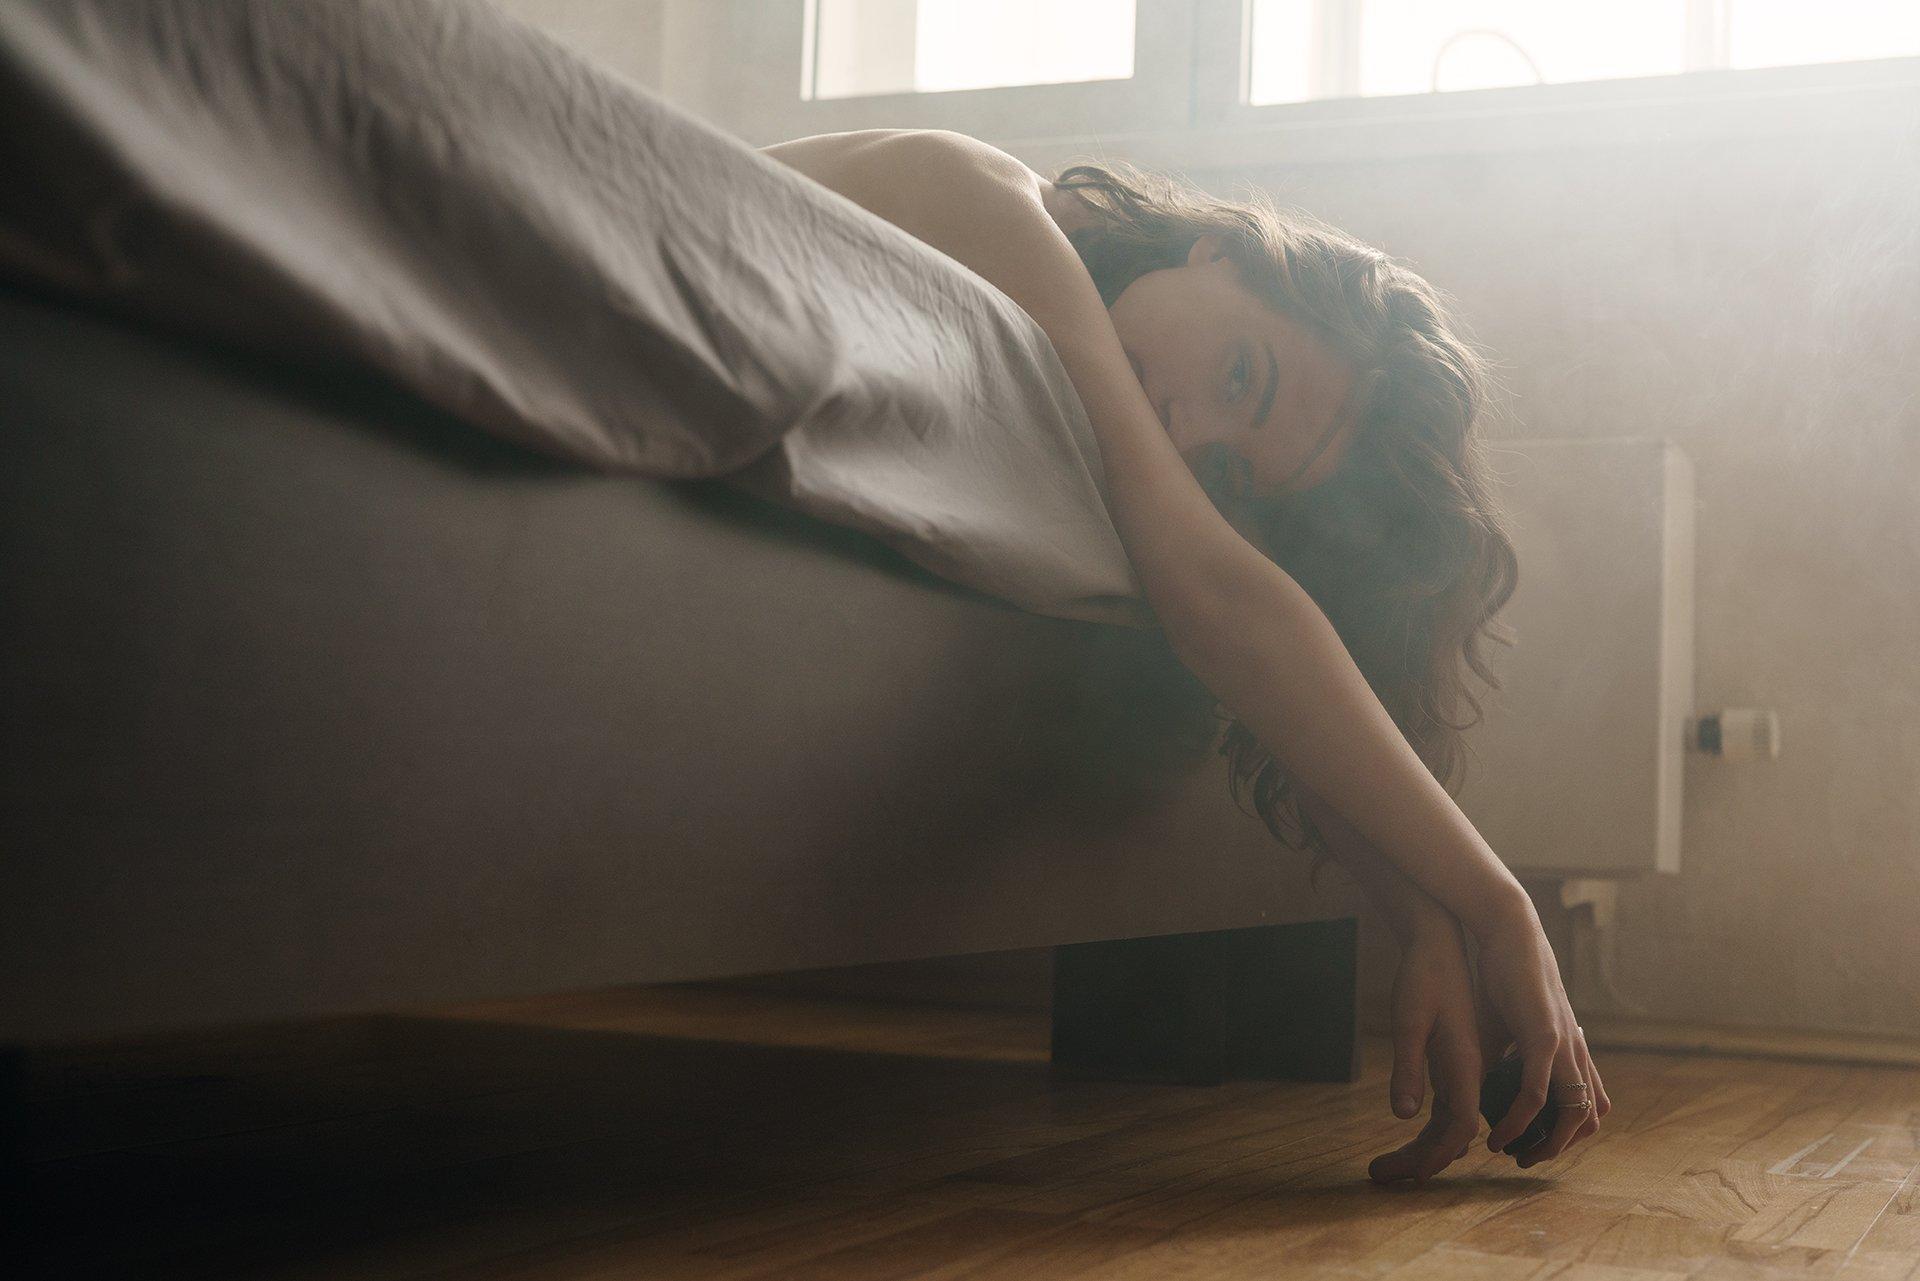 girl, nude, naked, moscow, alone, at home, bed, smoke, morning, Роман Филиппов